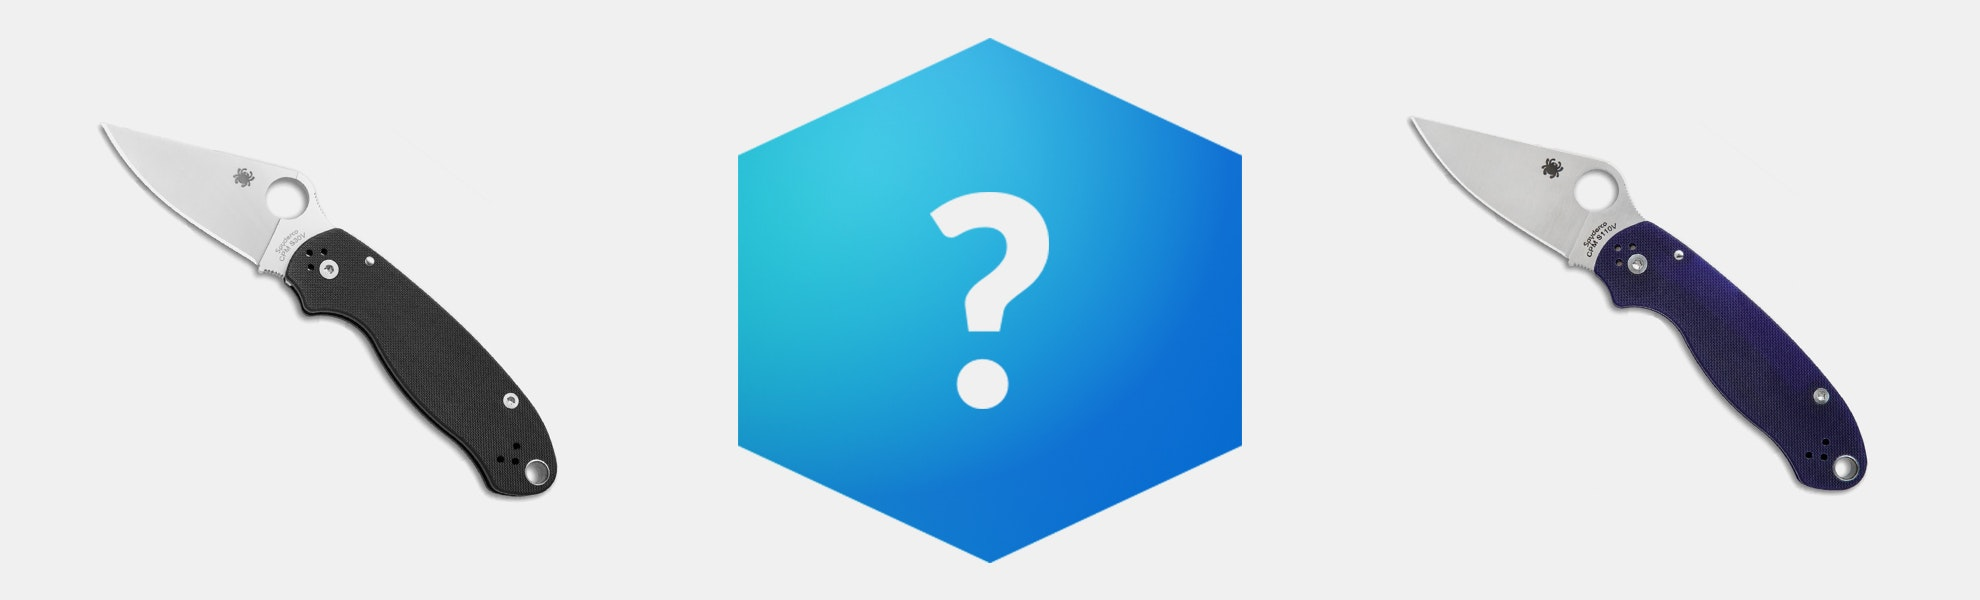 Massdrop Blue Box: Spyderco Para 3